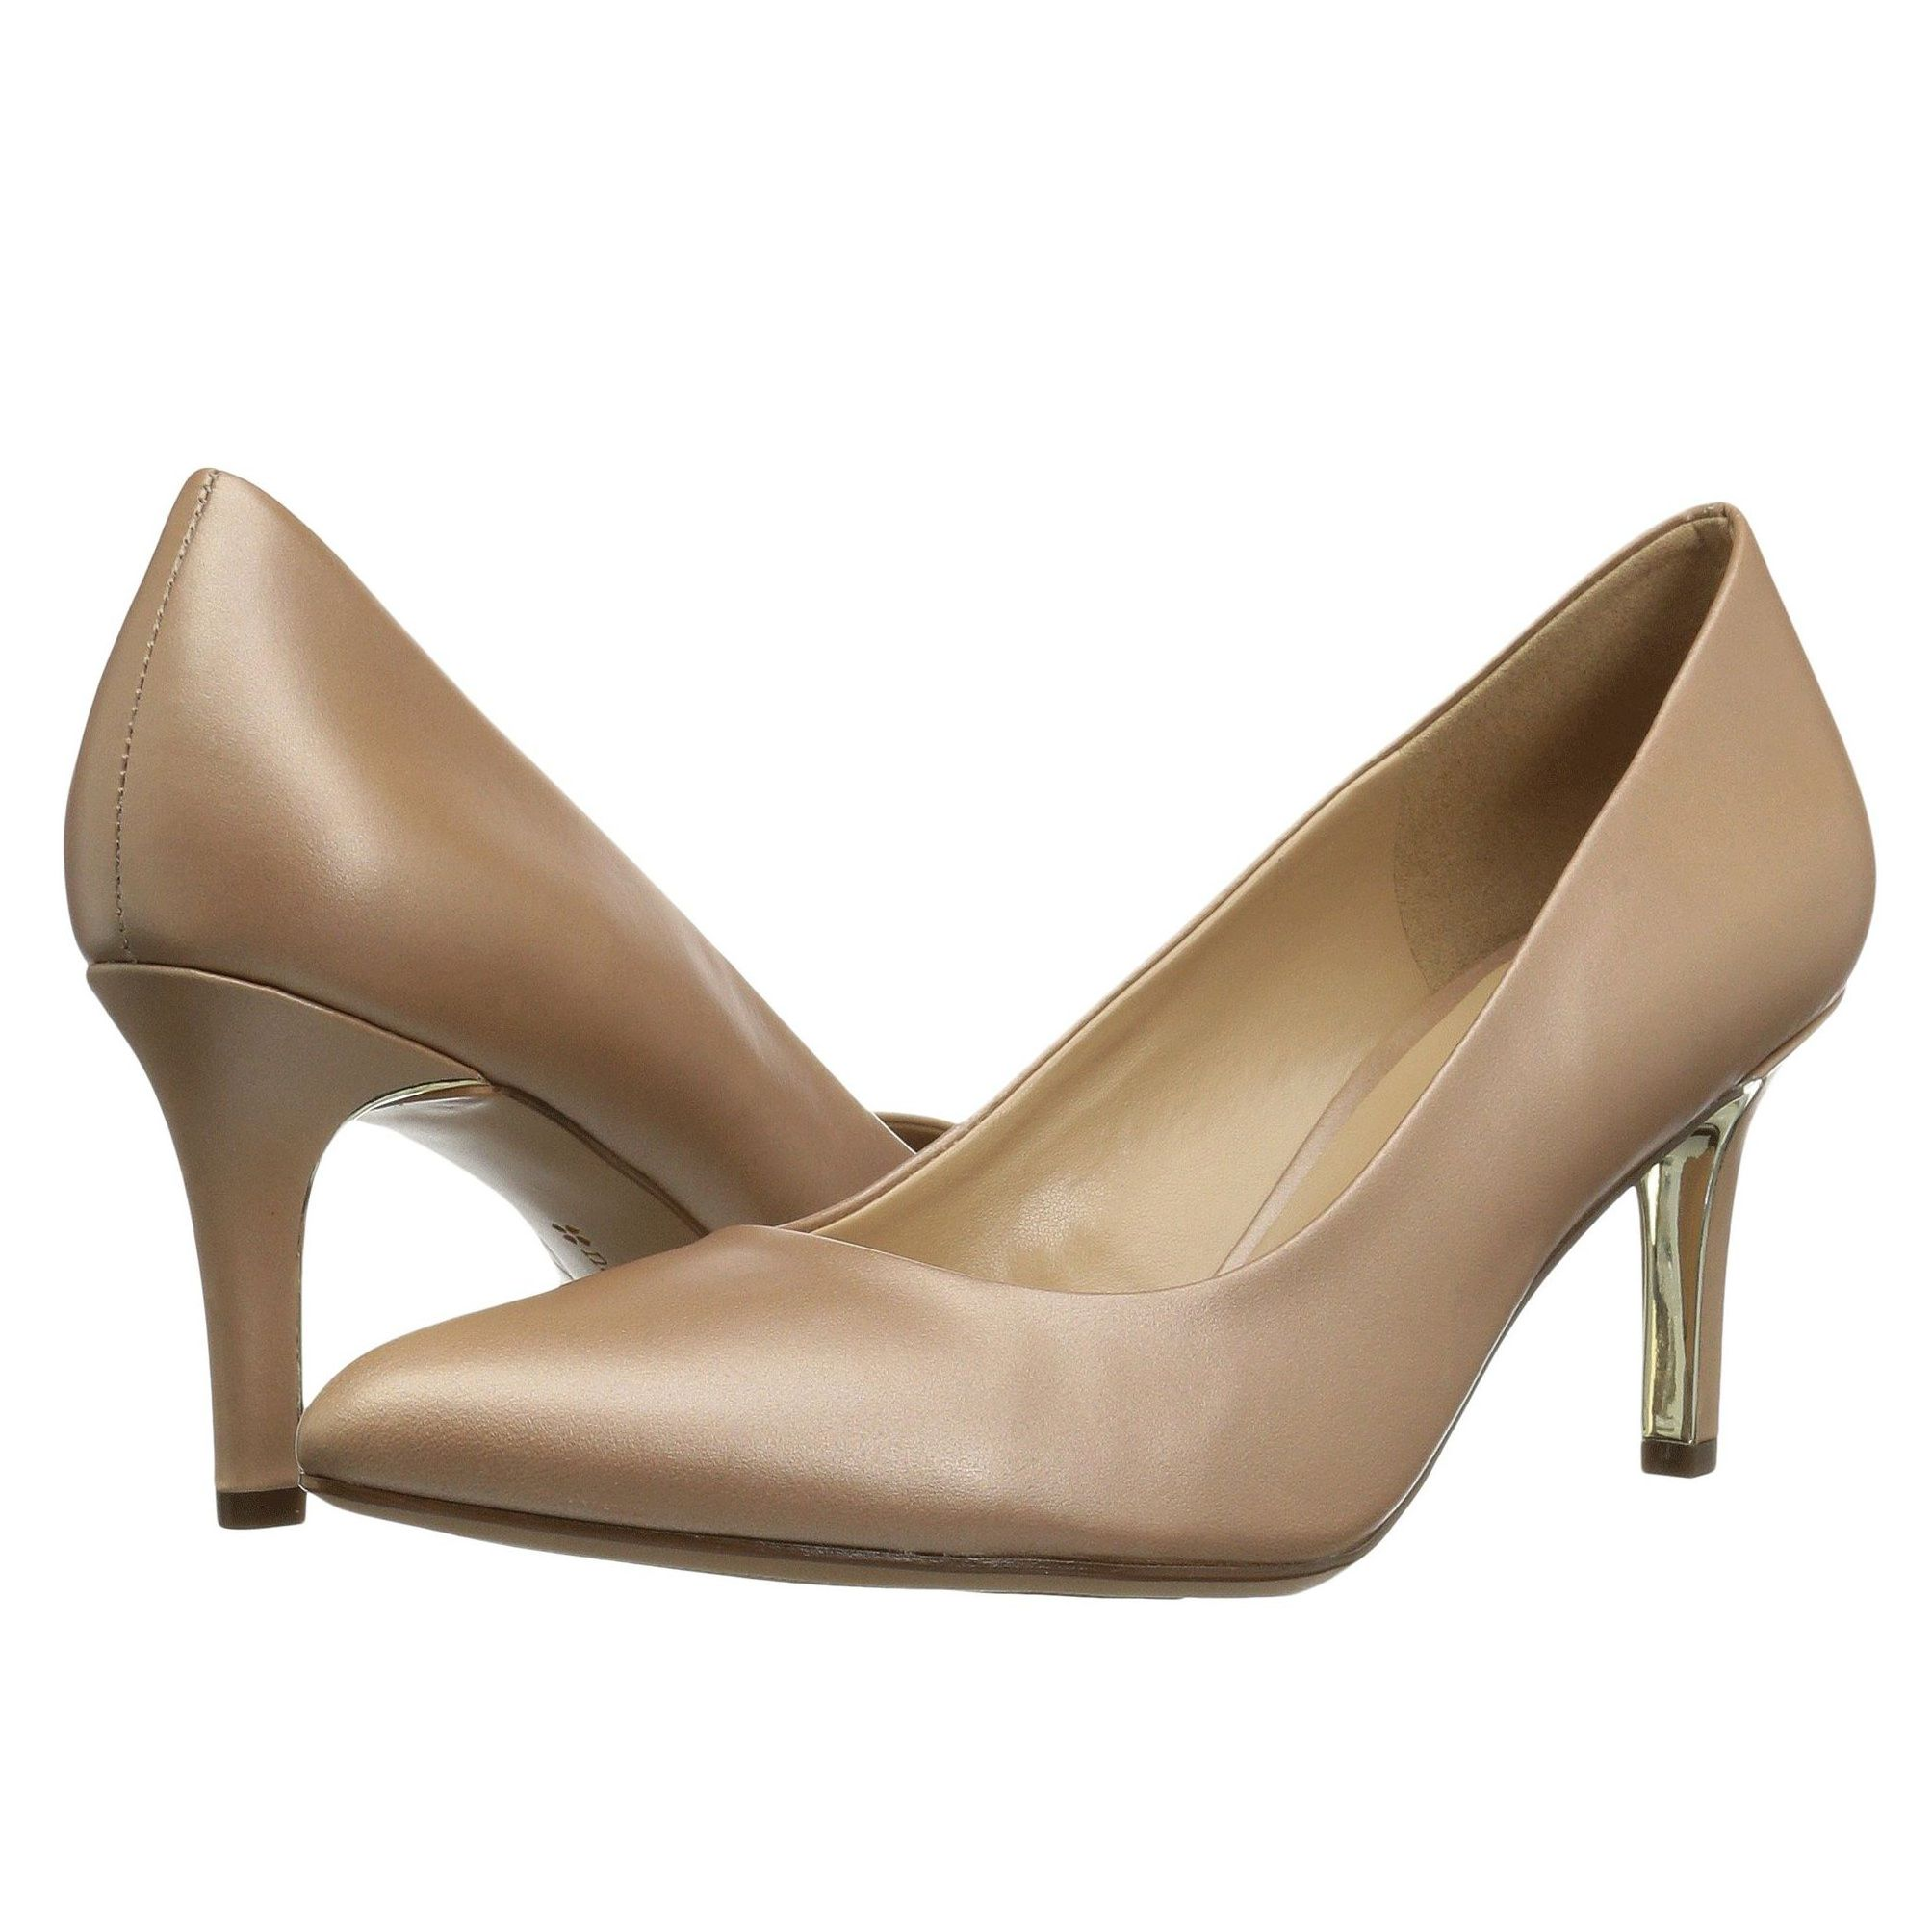 7a383c0e334 Most Comfortable Heels 2018 - Comfortable High Heels for Weddings ...